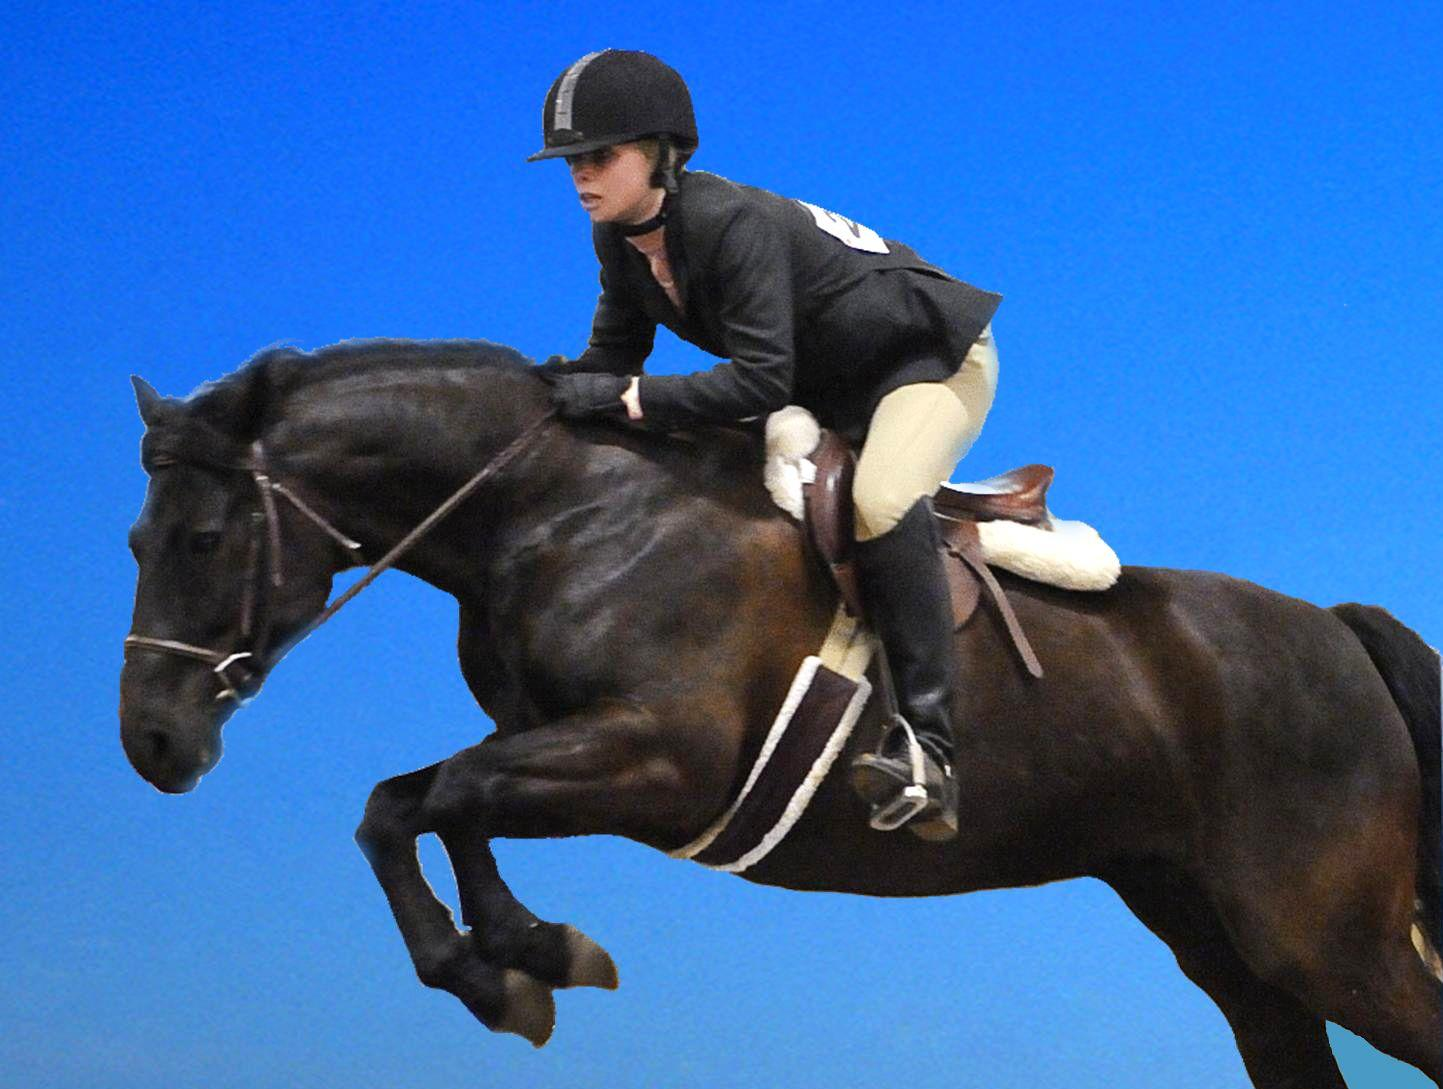 Black Horse Jumping Wallpapers Wallpaper Cave